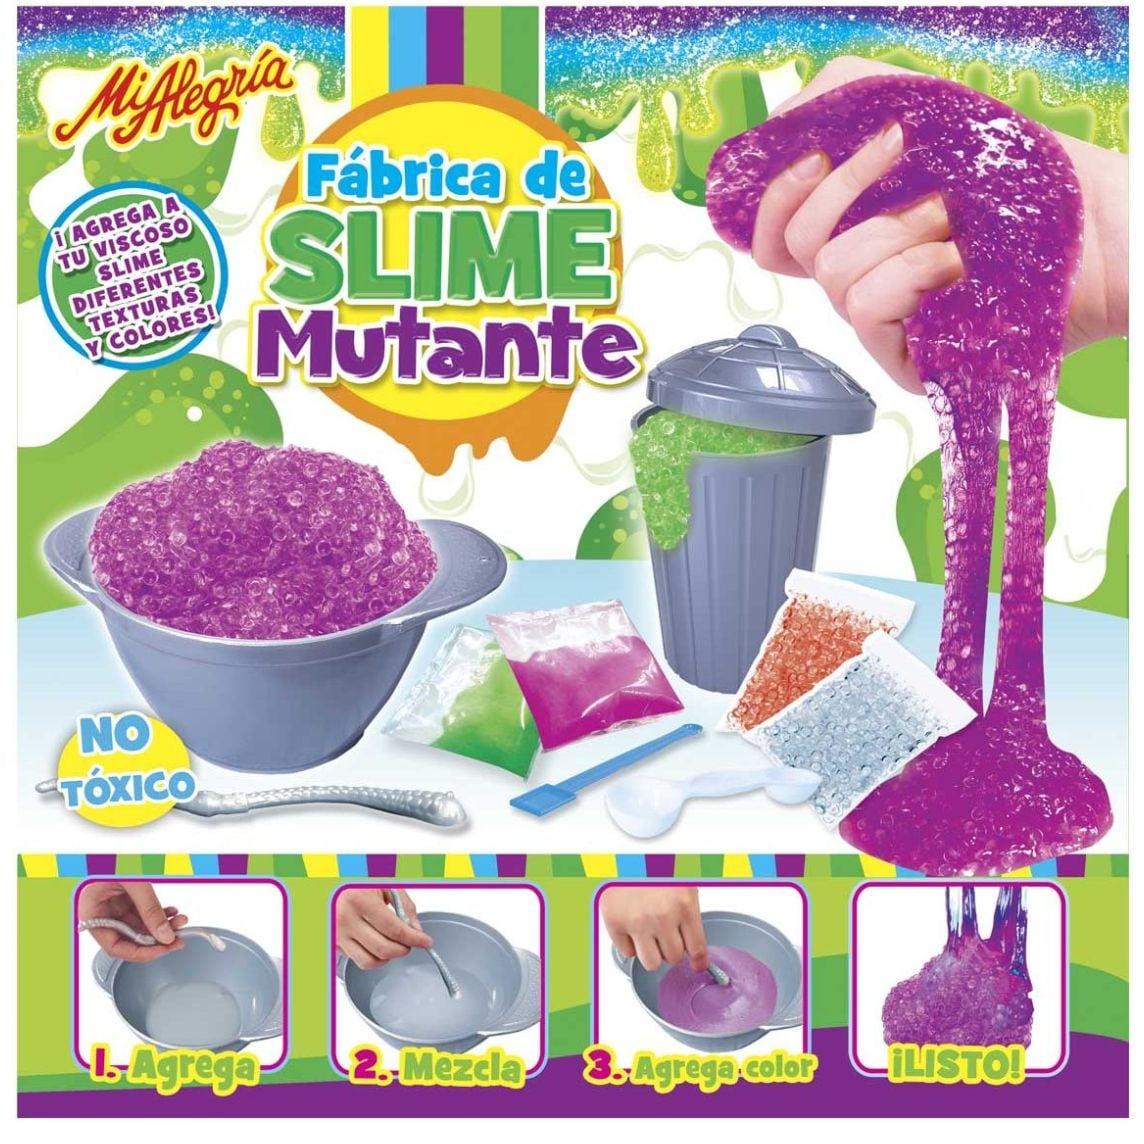 Fabrica de Slime Mutante Mi Alegria